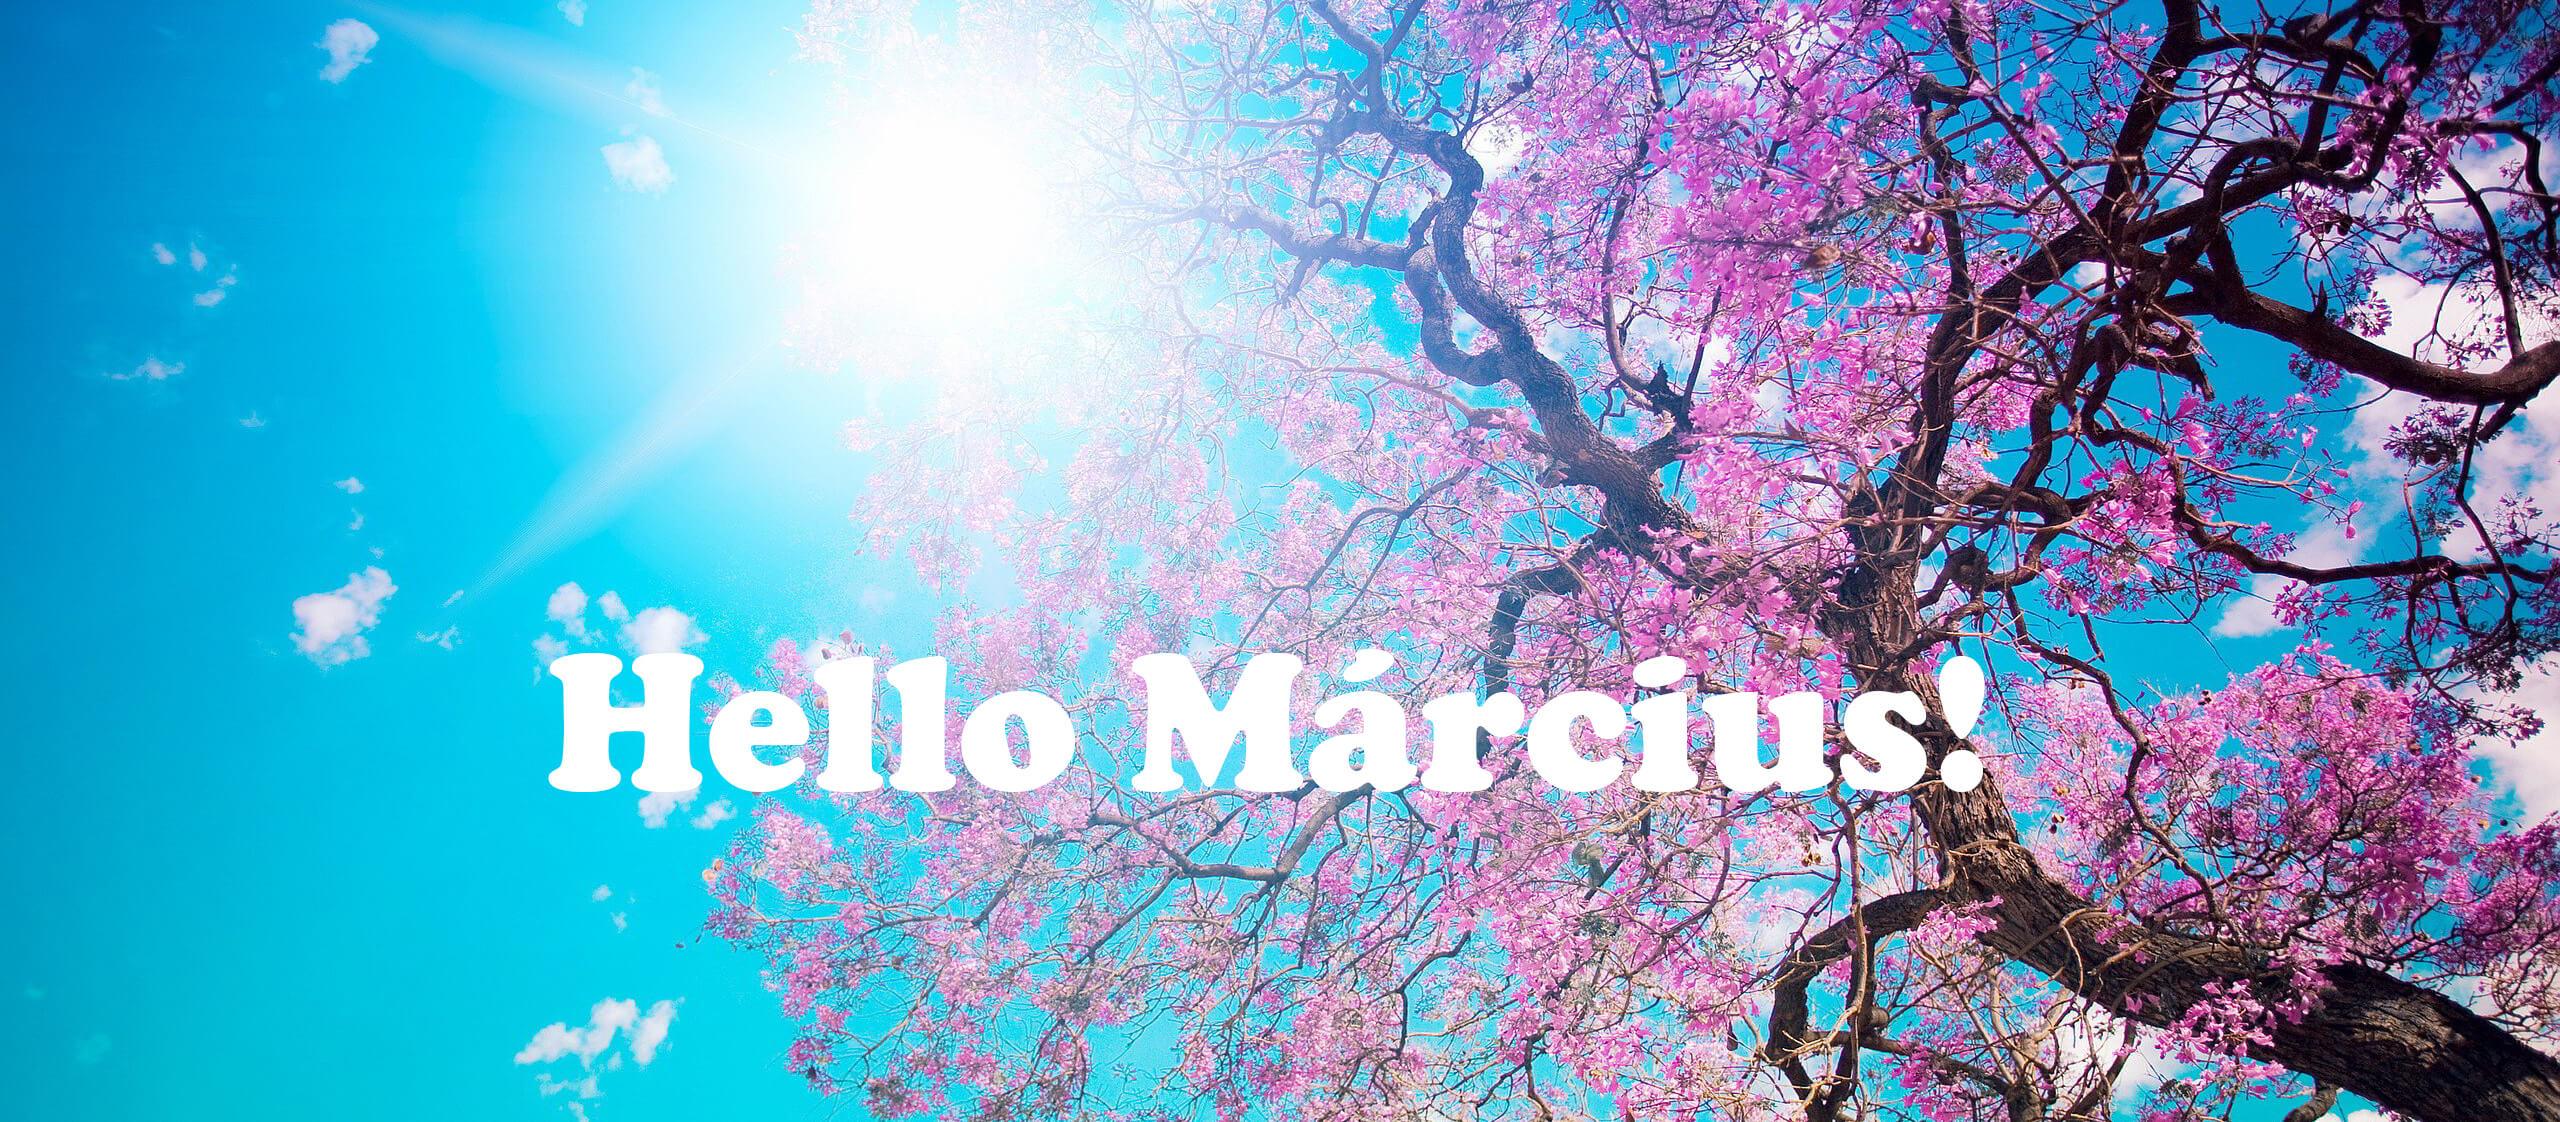 Hello március! | Igényesférfi.hu online férfi életmód magazin